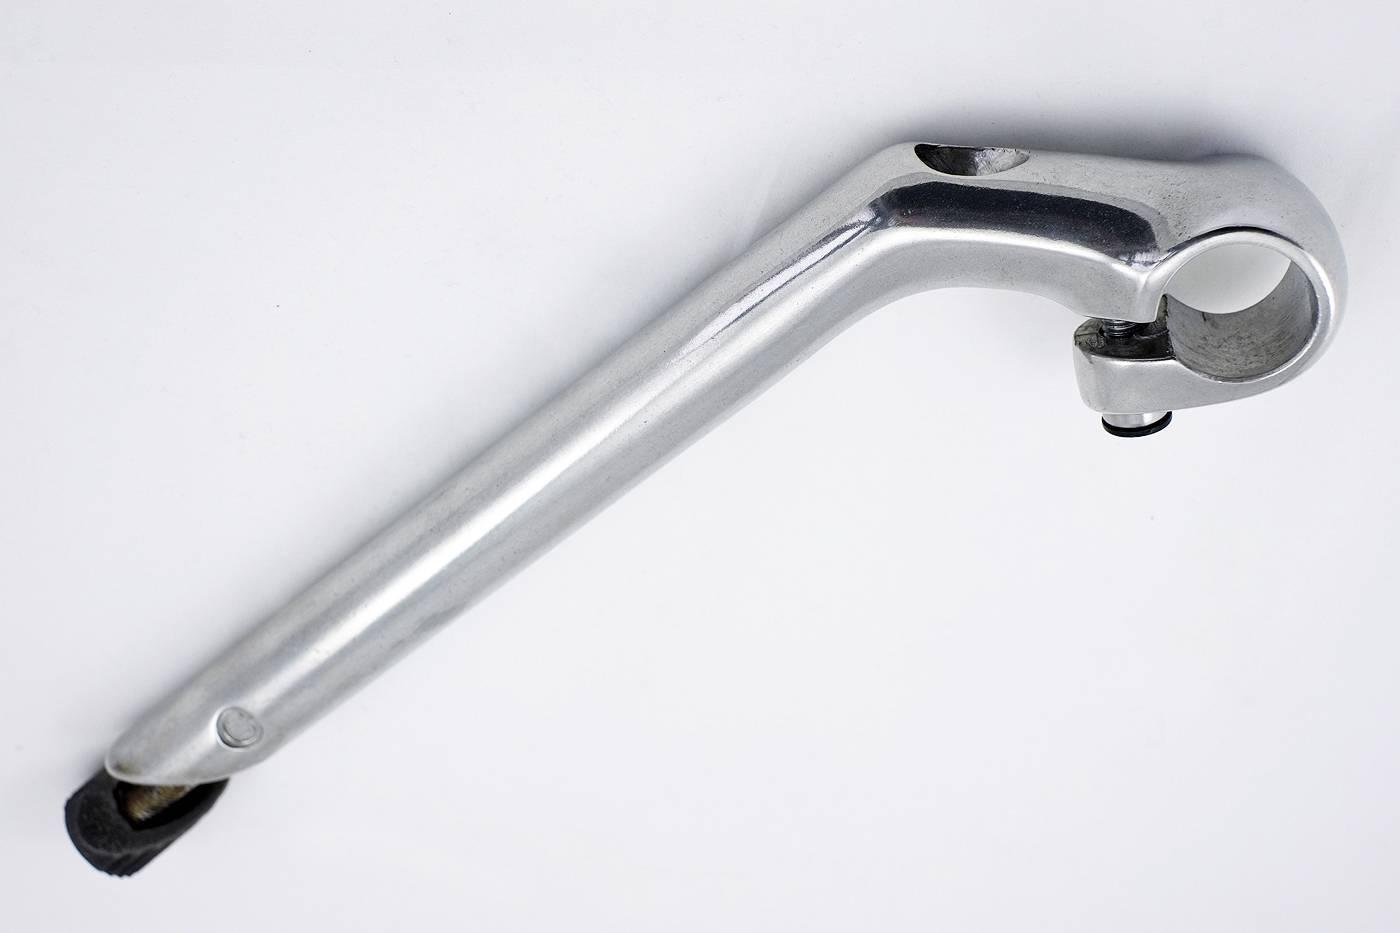 1 inch aluminium stem Singlespeed / Fixie - long shank